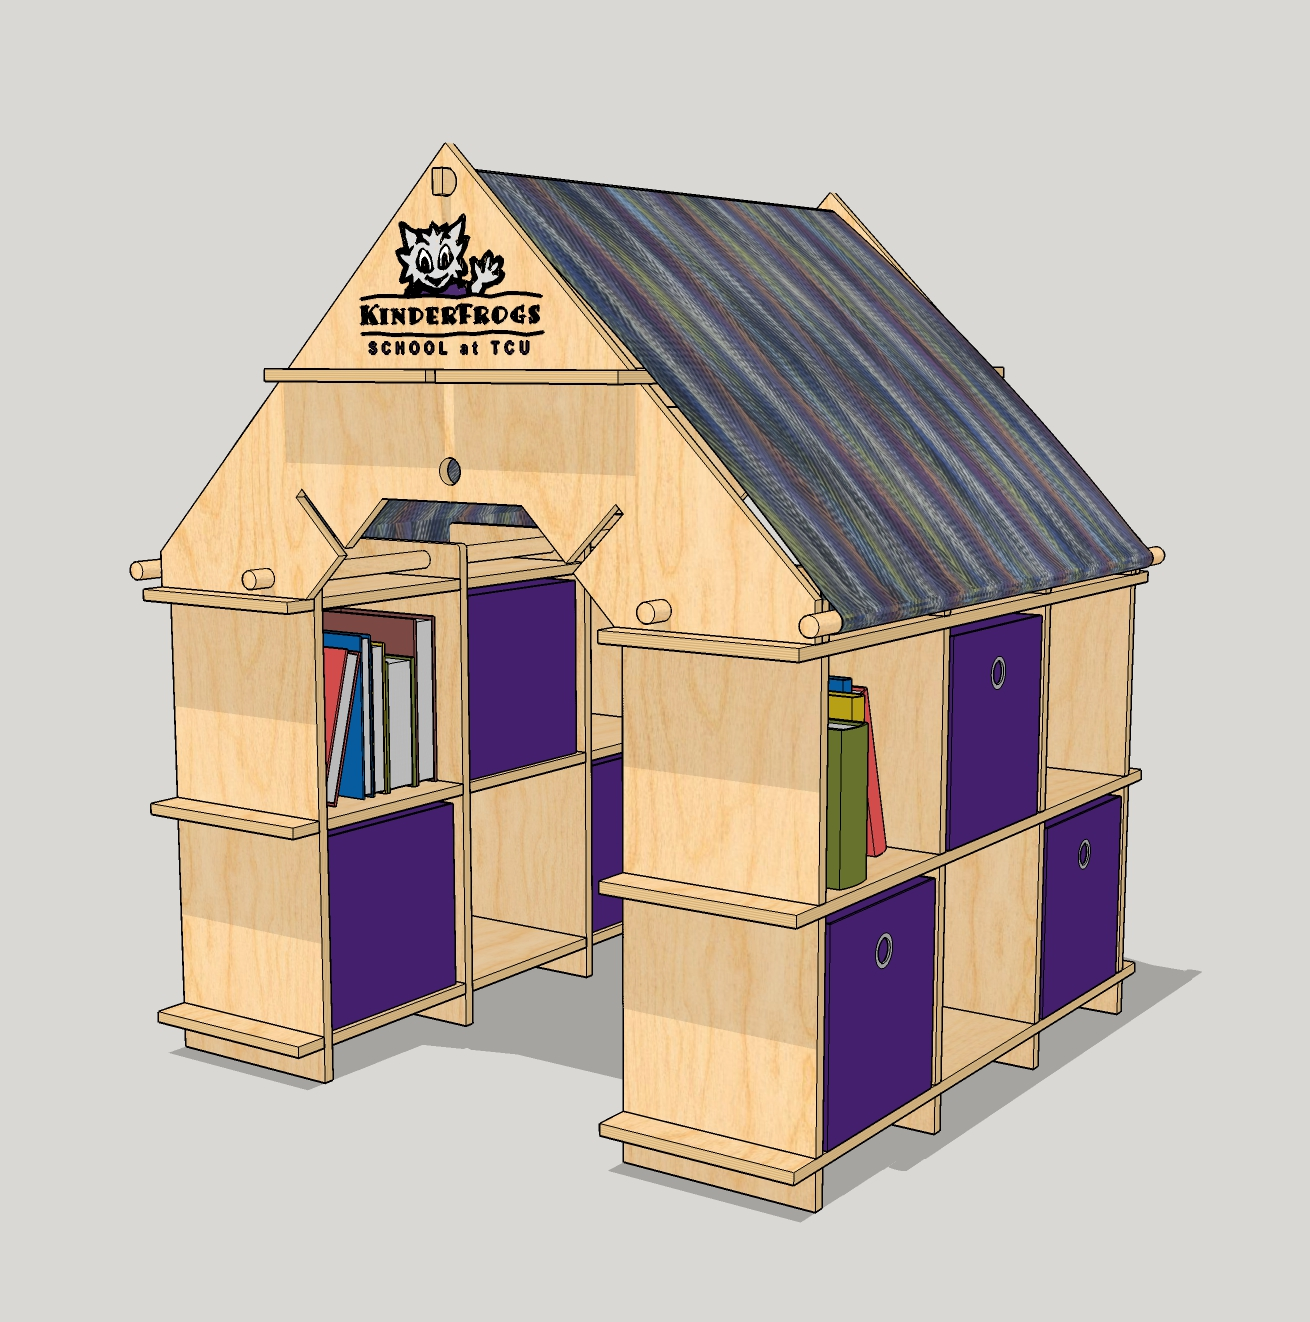 Original design model of the convertible playhouse